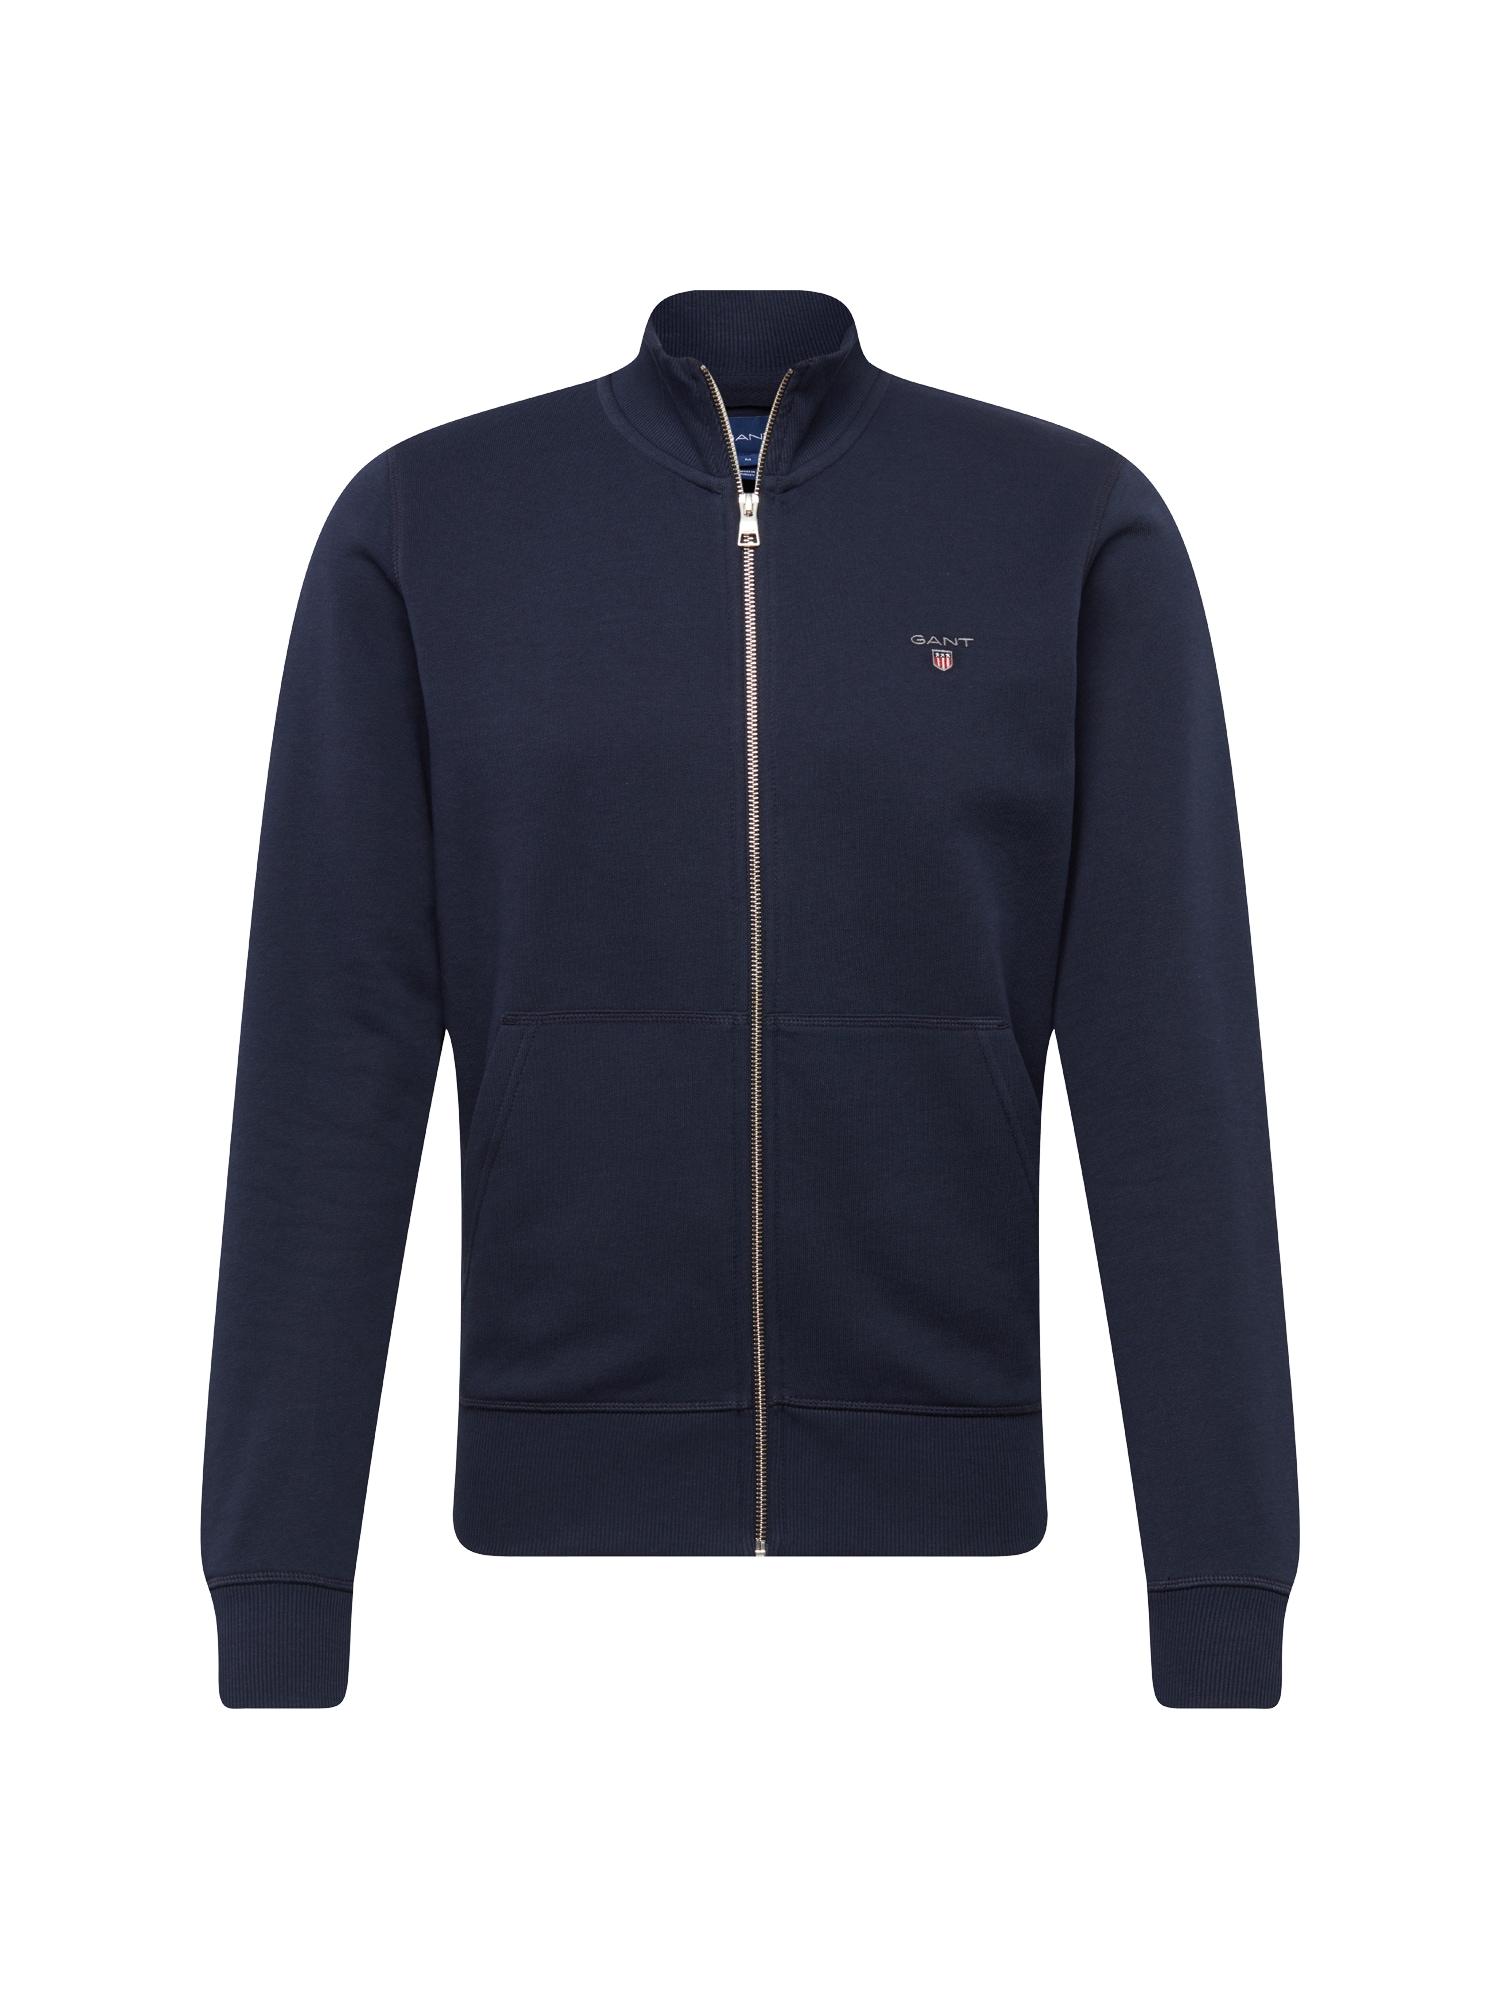 Sweatjacke | Bekleidung > Sweatshirts & -jacken | Gant